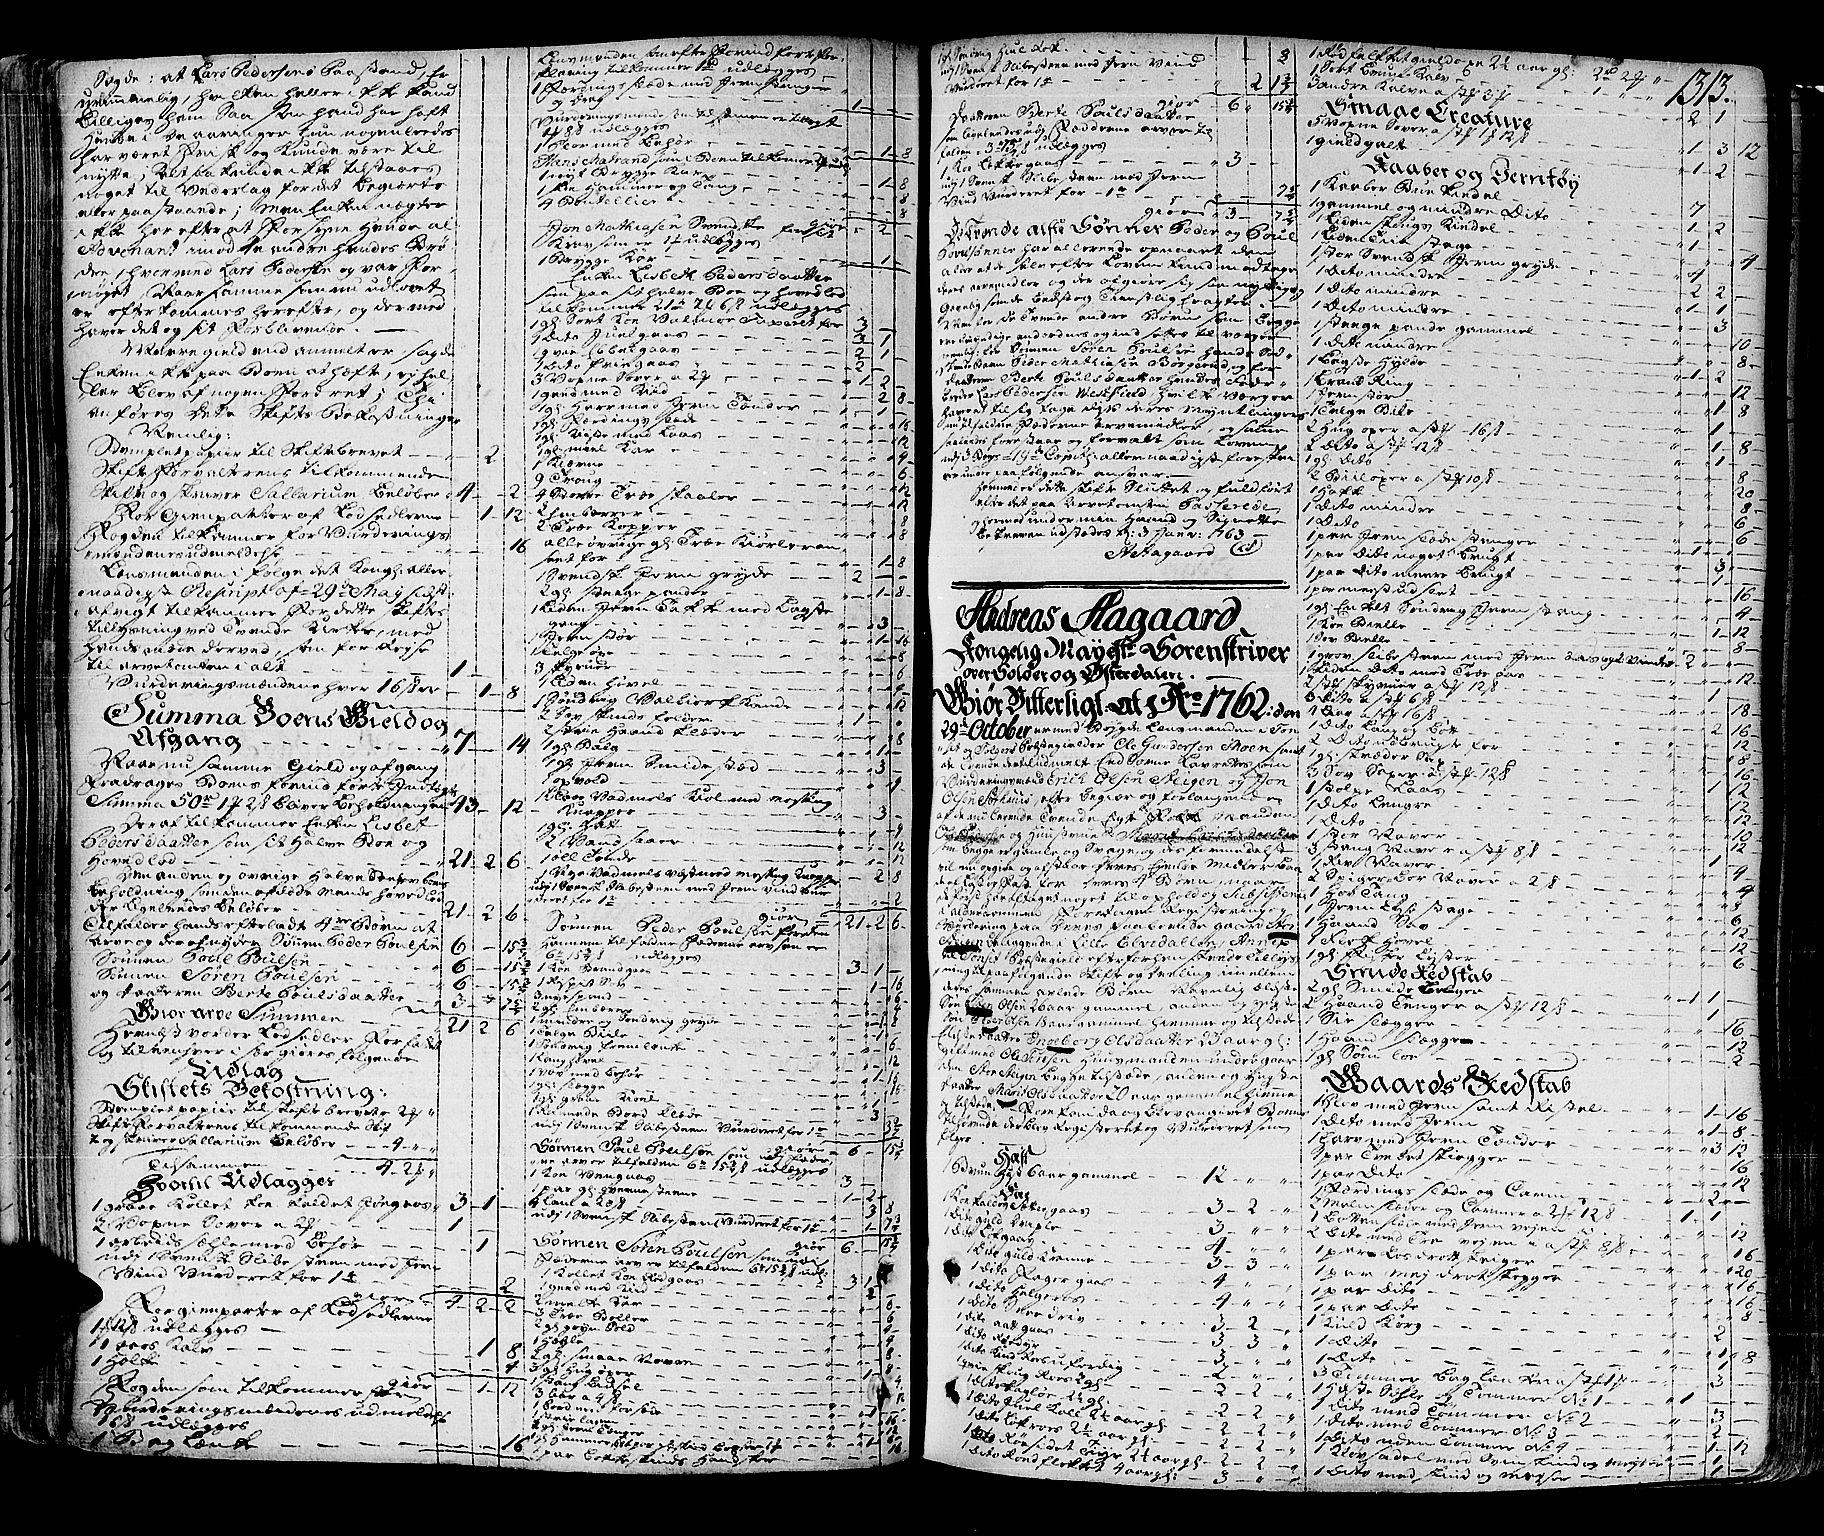 SAH, Solør og Østerdalen sorenskriveri, J/Ja/L0012A: Skifteprotokoll, 1757-1764, s. 1312b-1313a